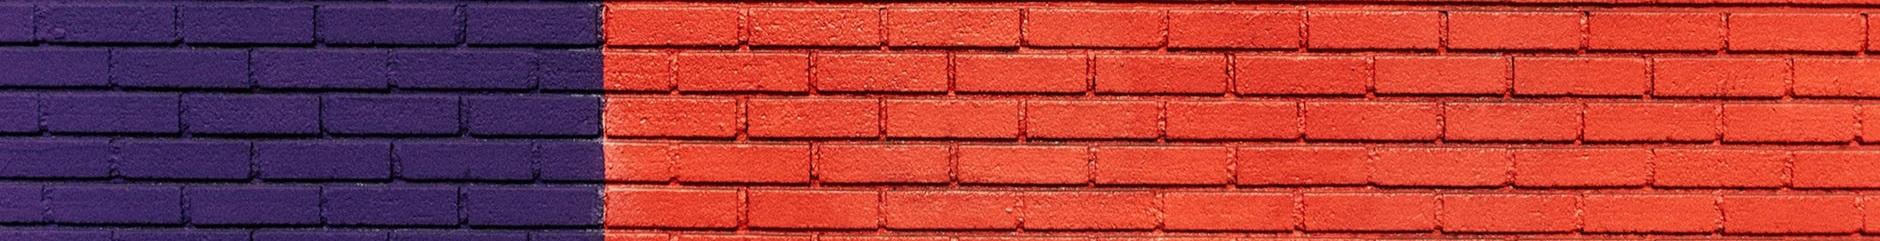 red-blue-bricks-pattern-1.jpg